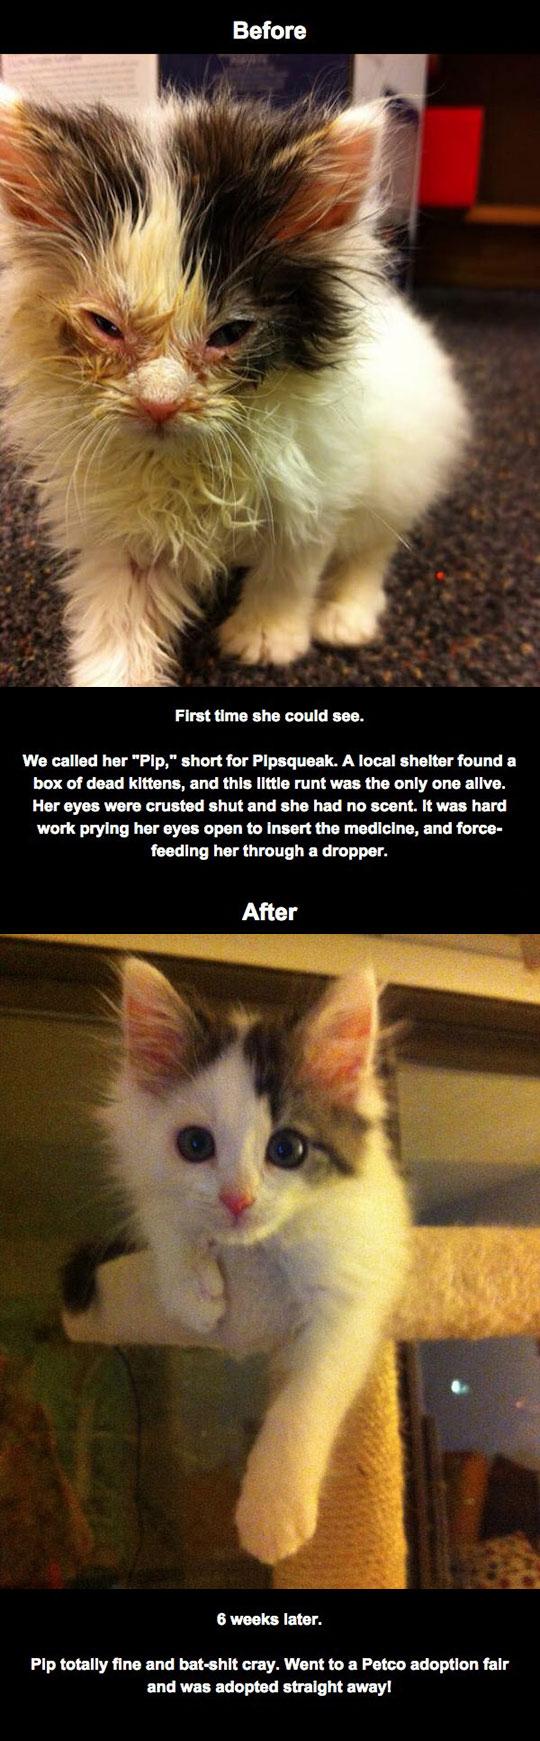 cute-kitty-blind-eye-infection